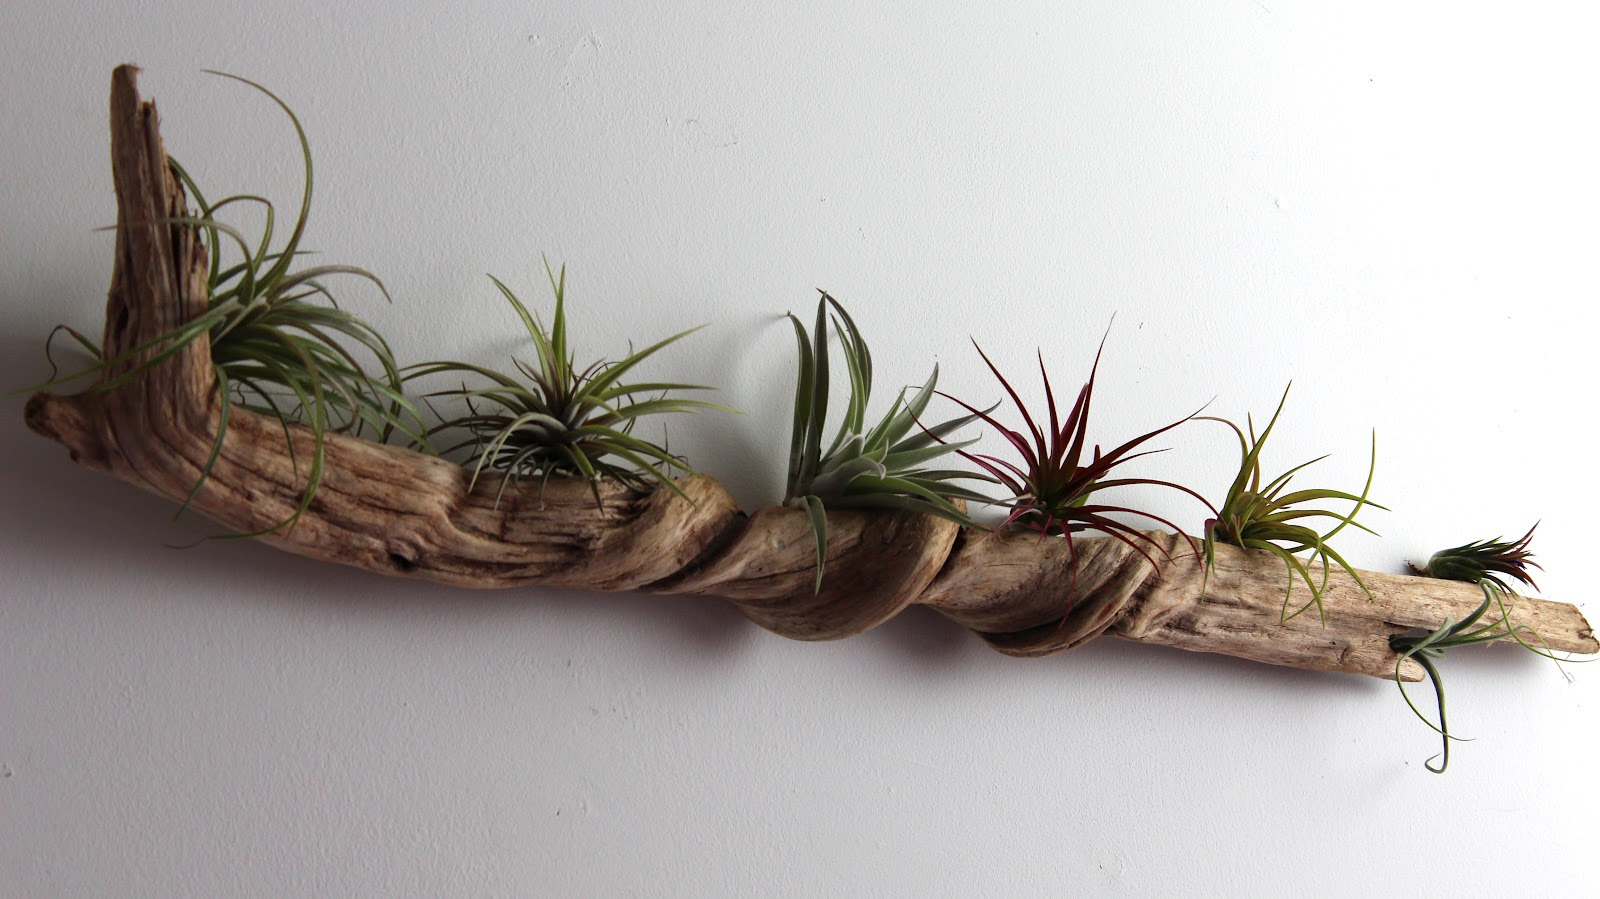 nest diy driftwood wall garden. Black Bedroom Furniture Sets. Home Design Ideas